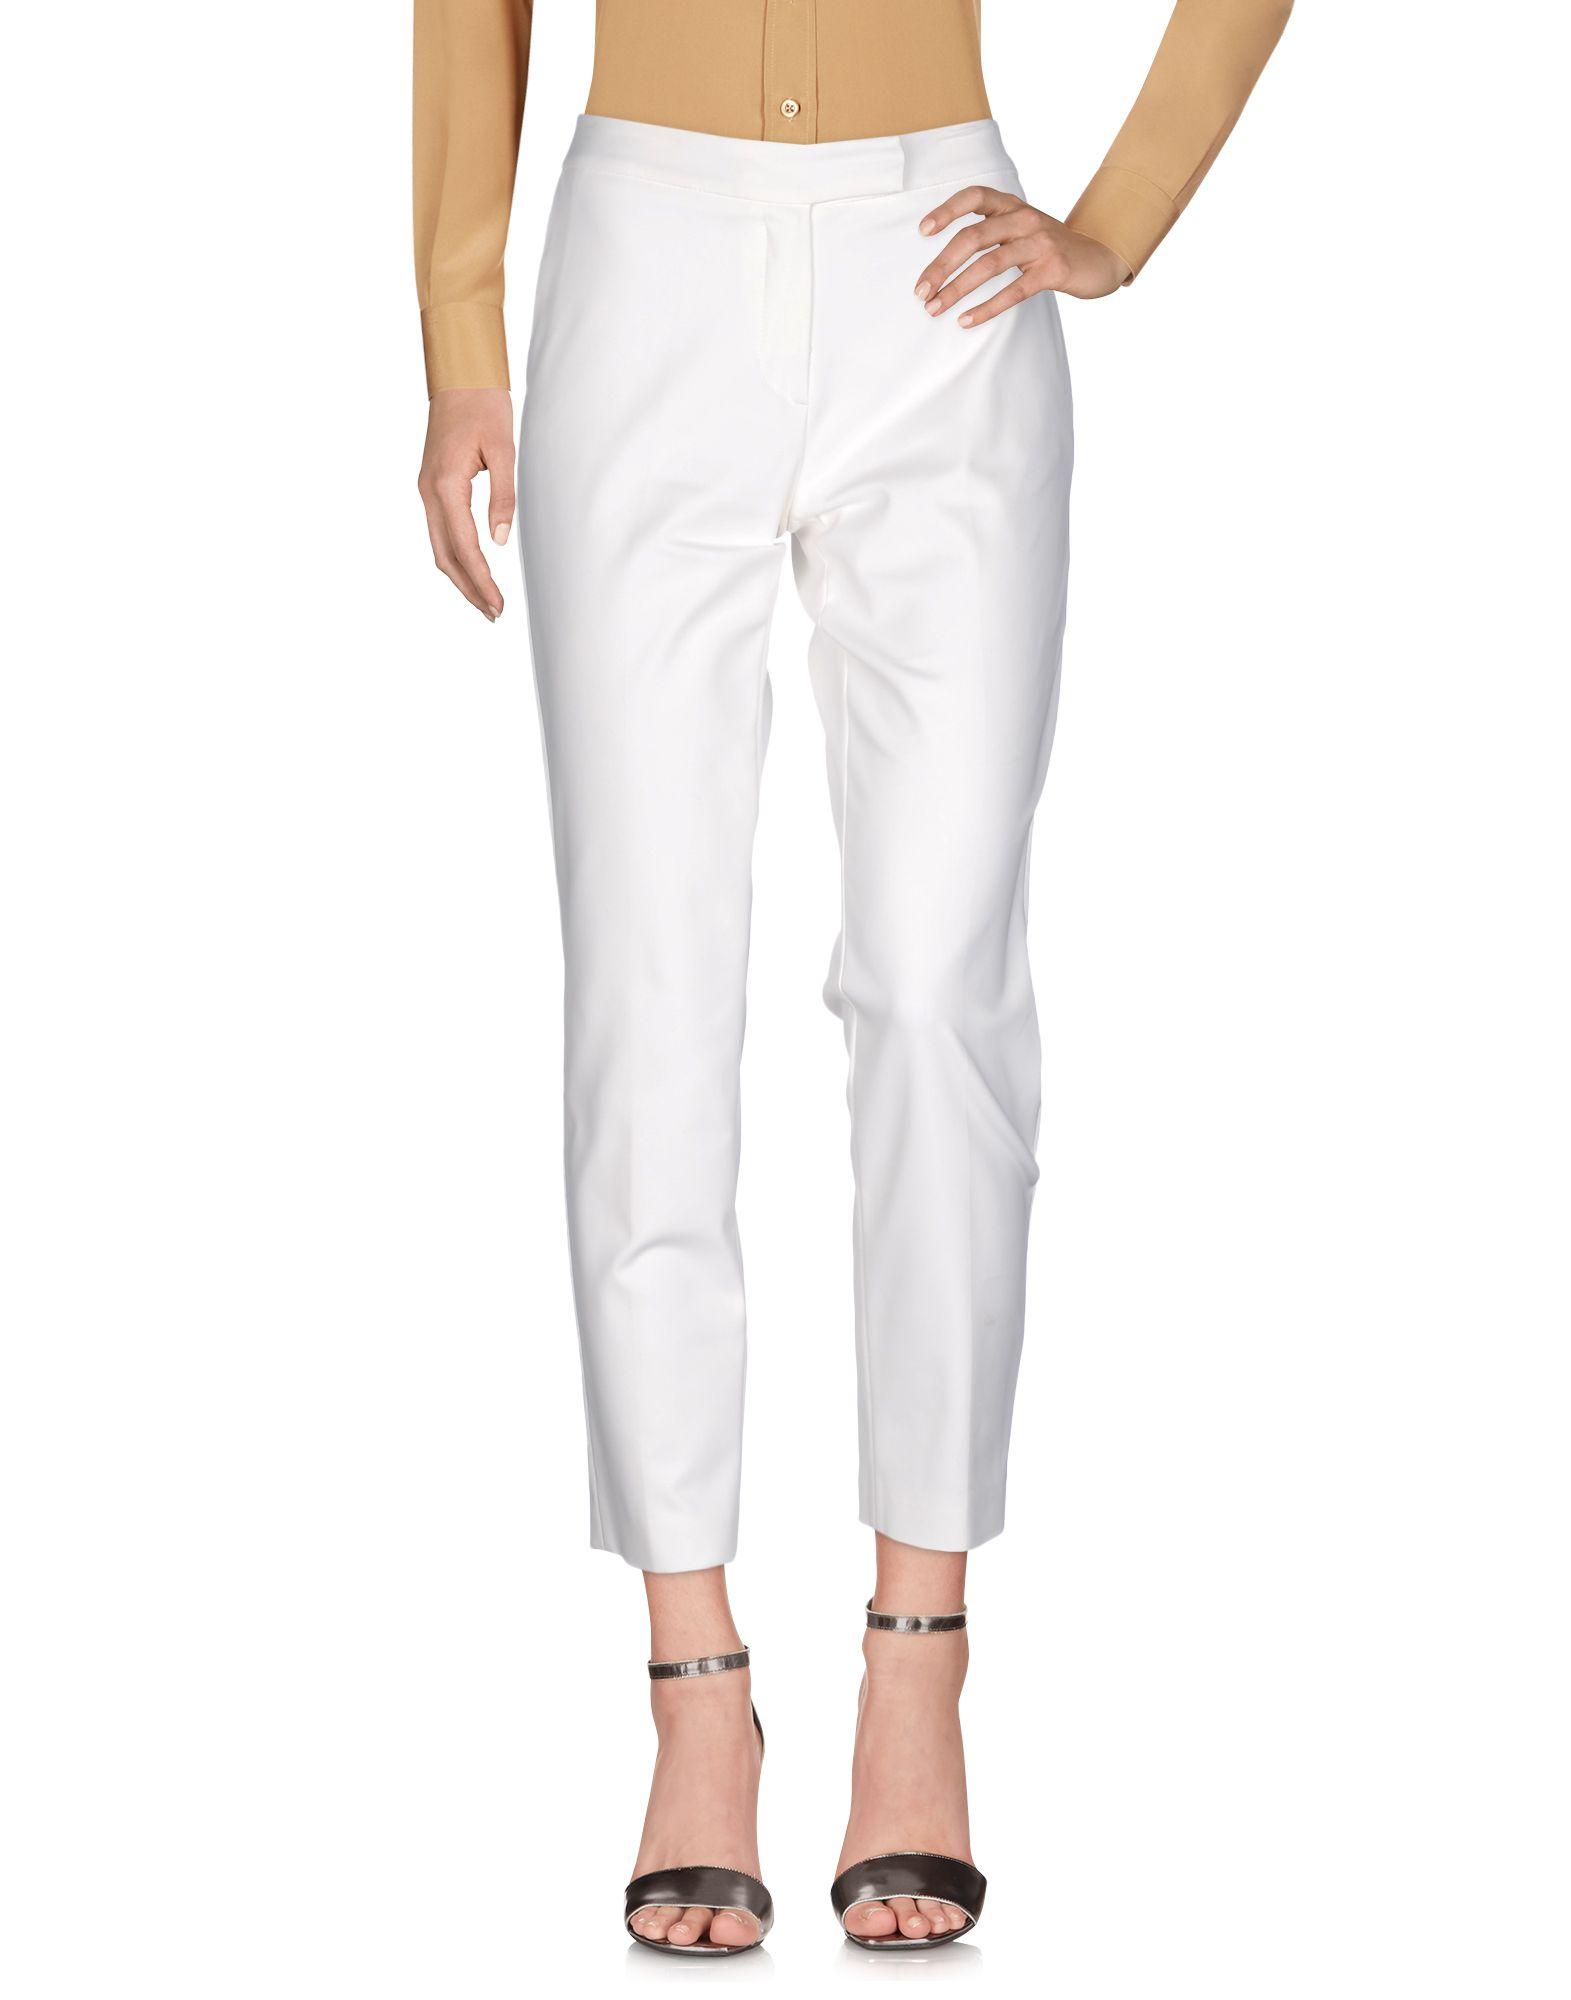 Pantalone Clips Donna - Acquista online su umyZCzJ3y